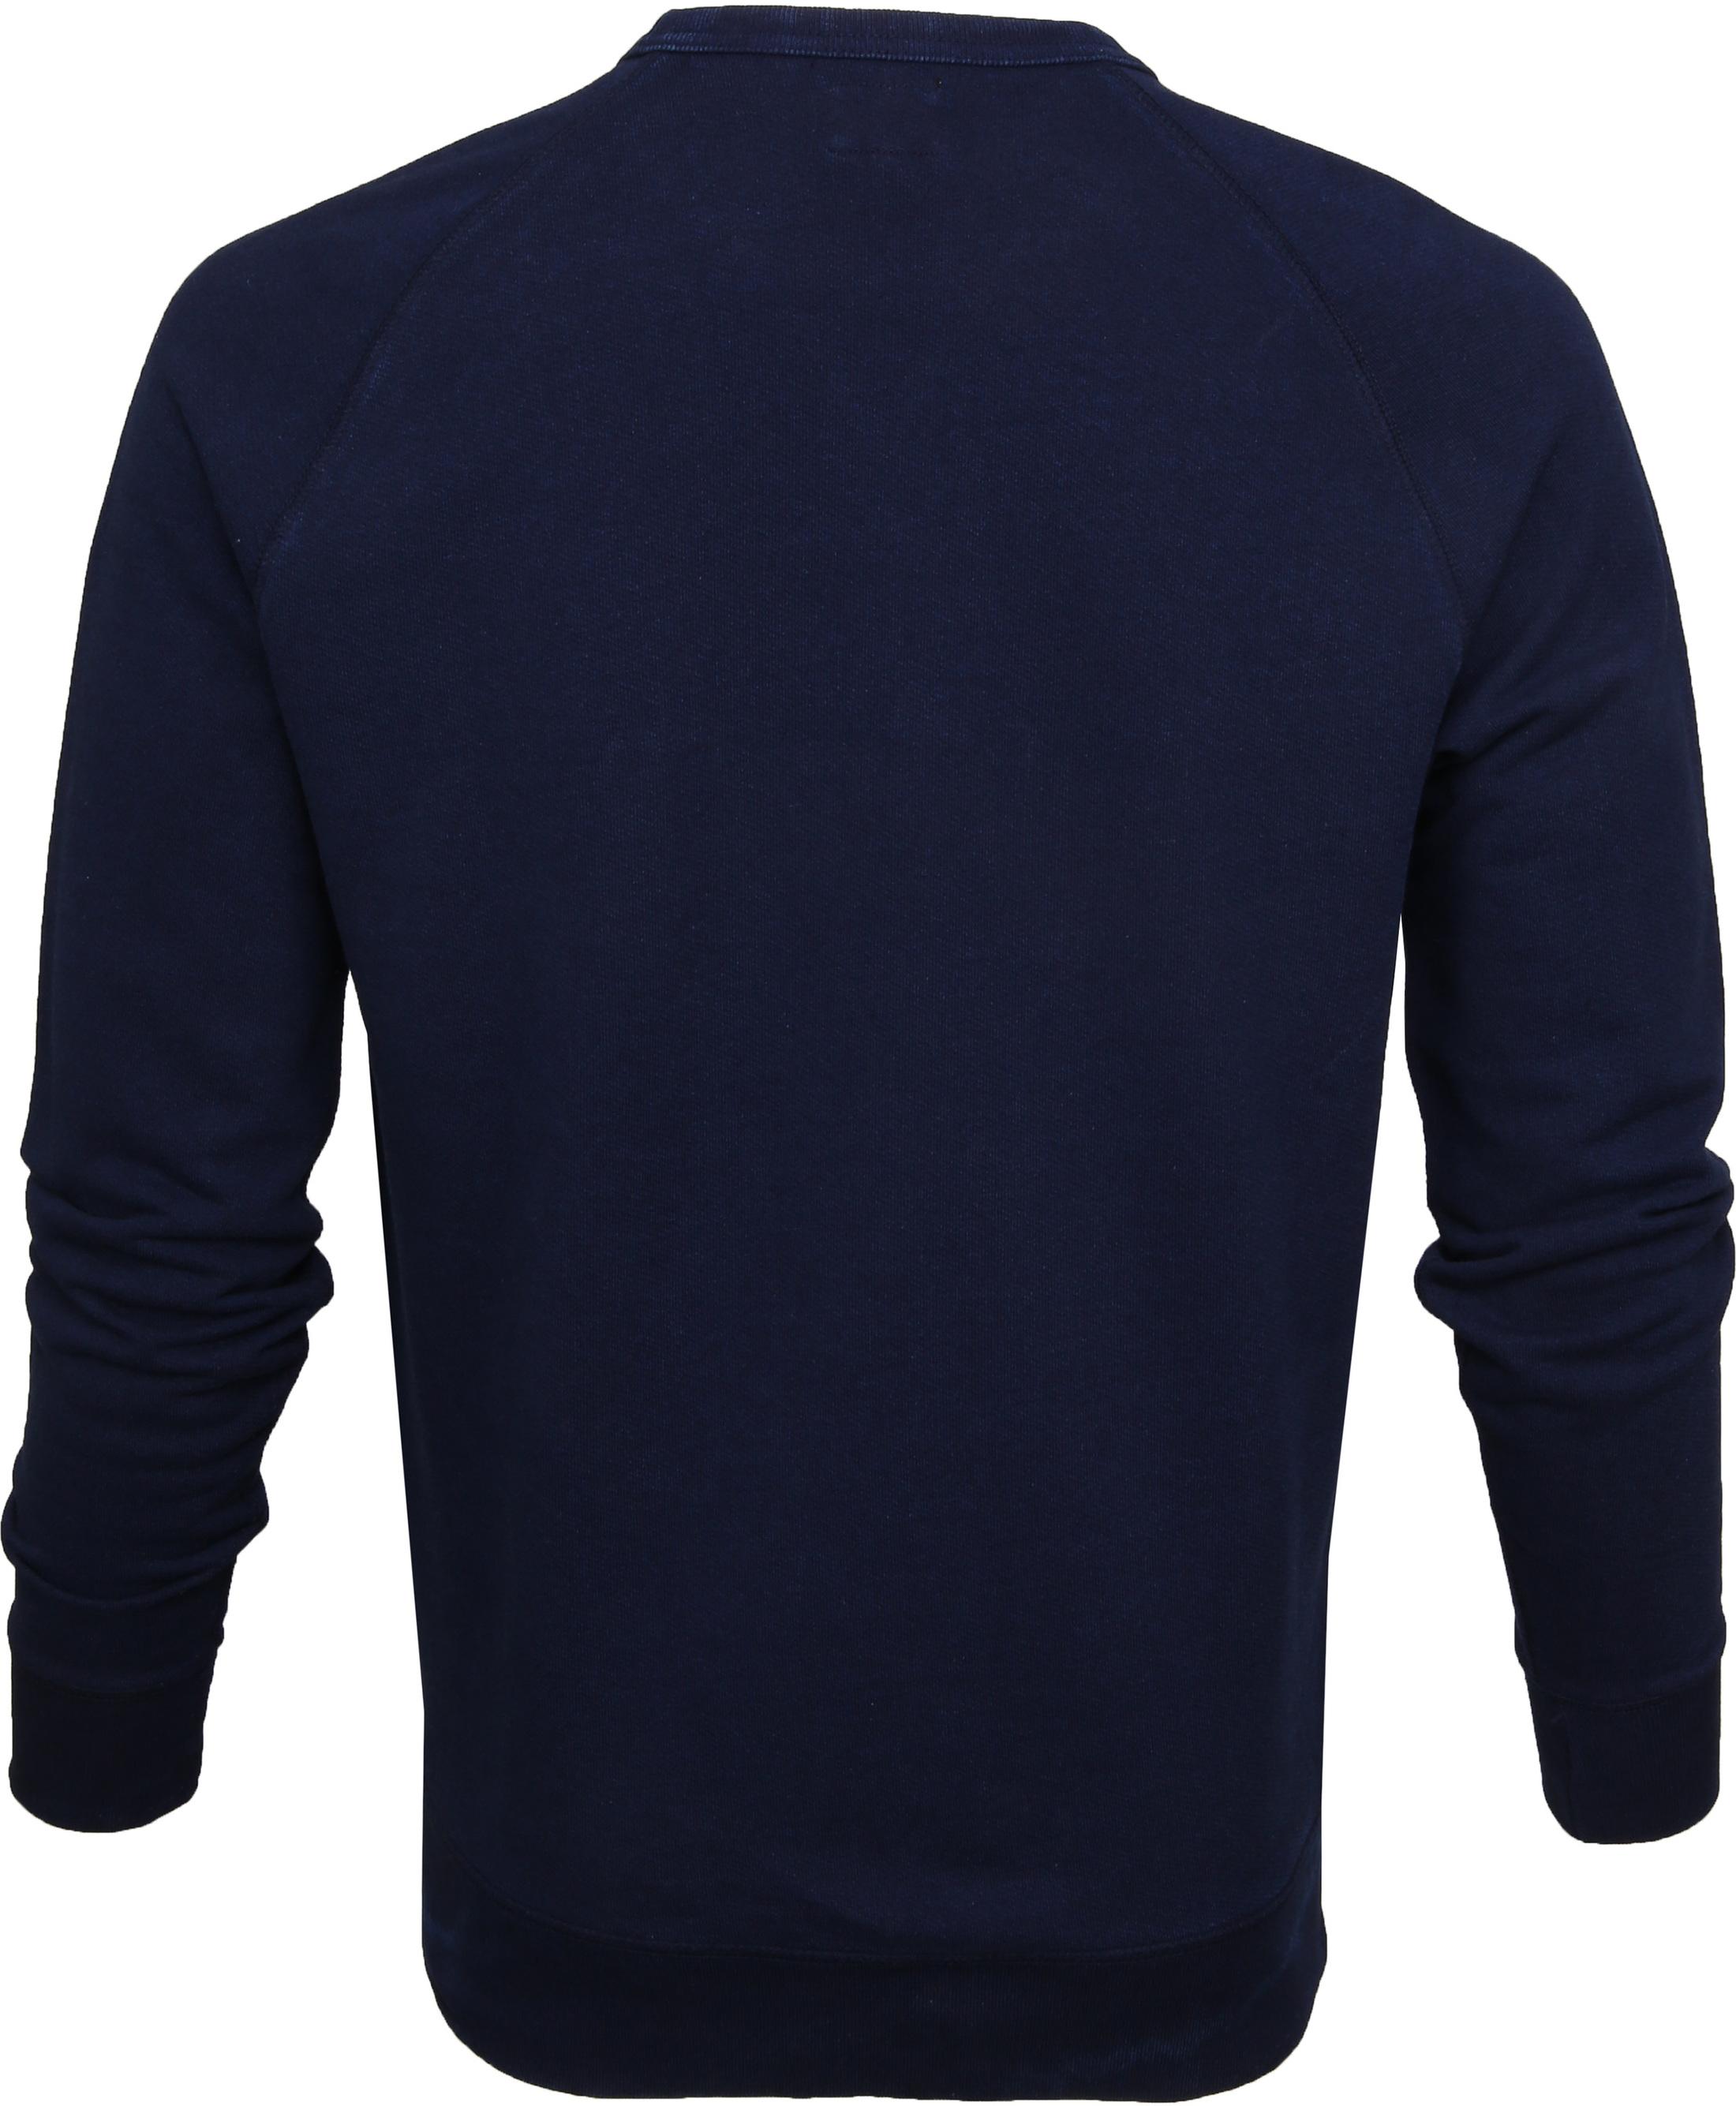 Levi's Original Sweater Navy photo 3